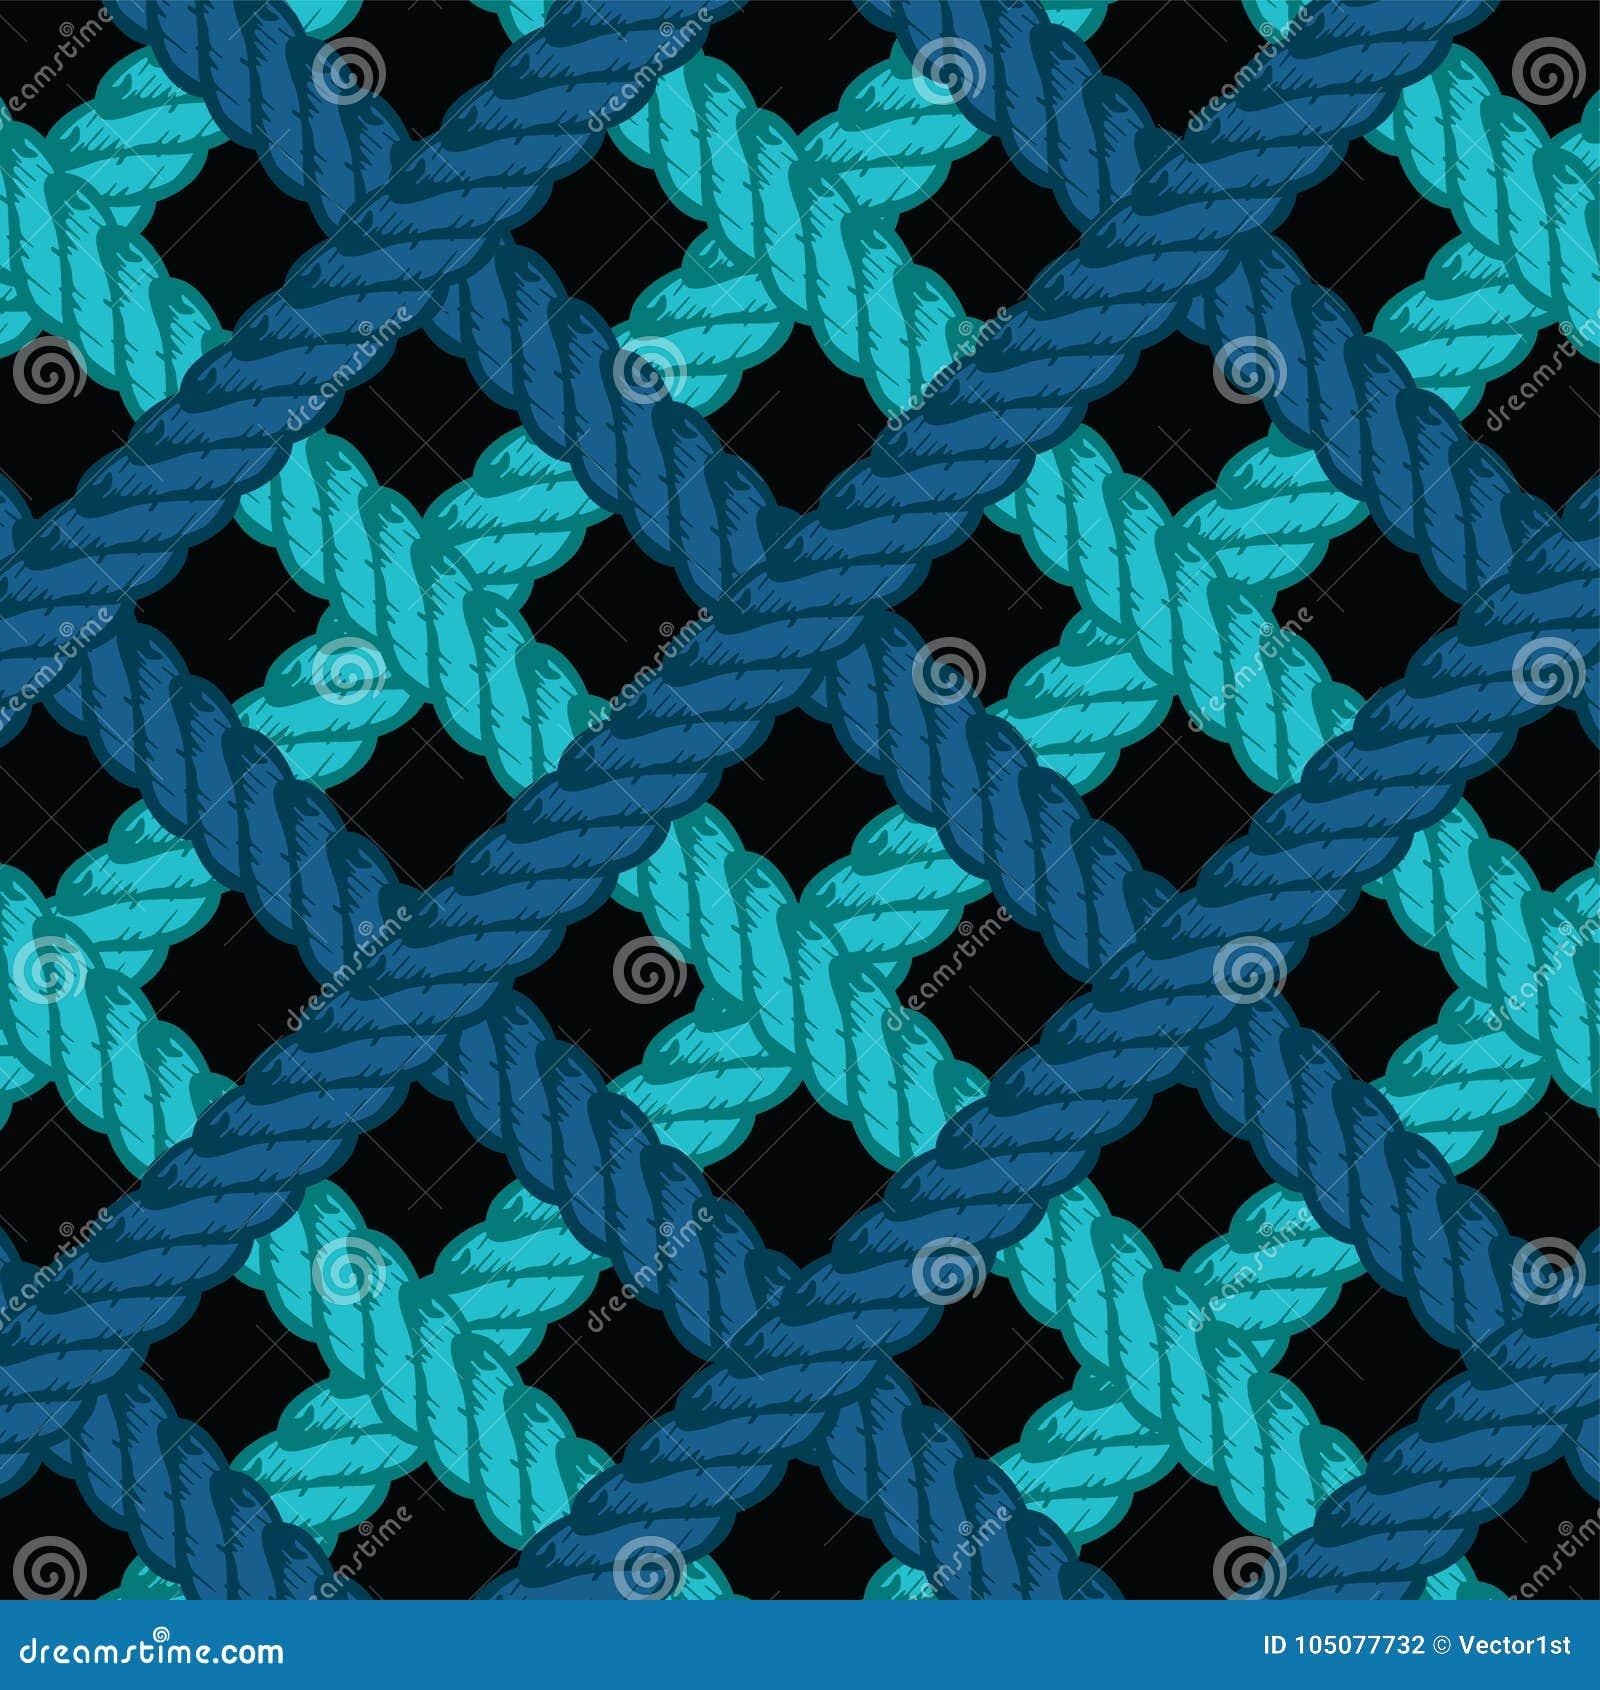 Lasso Rope Pattern Background Wallpaper Stock Vector Illustration Of Lasso Crochet 105077732